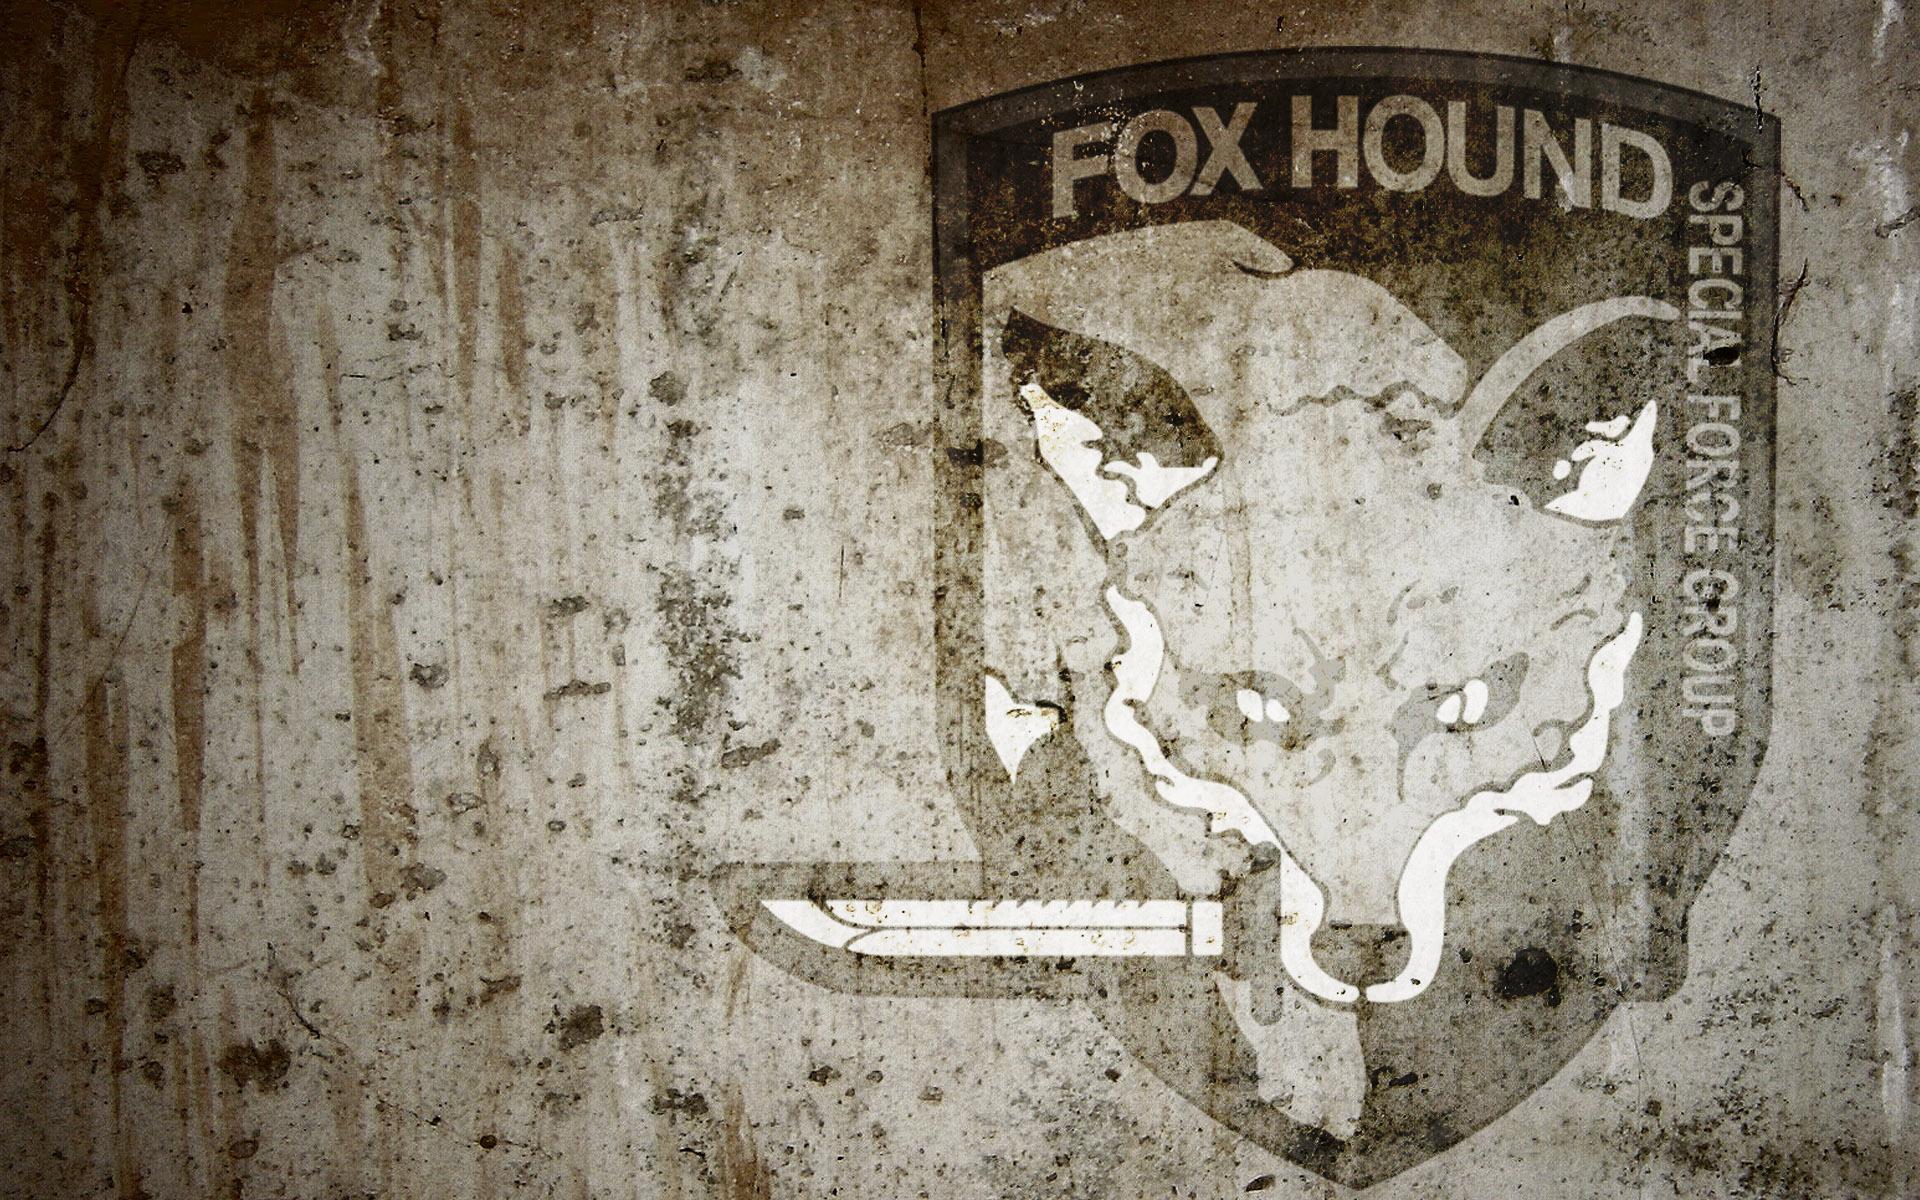 Metal gear solid iphone wallpaper wallpapersafari - Foxhound metal gear wallpaper ...